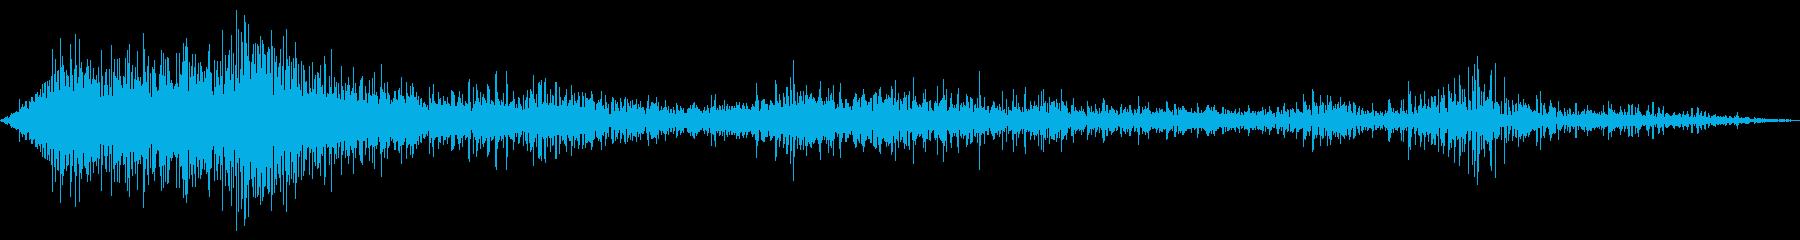 APOLLO 16の発売:燃焼後の...の再生済みの波形